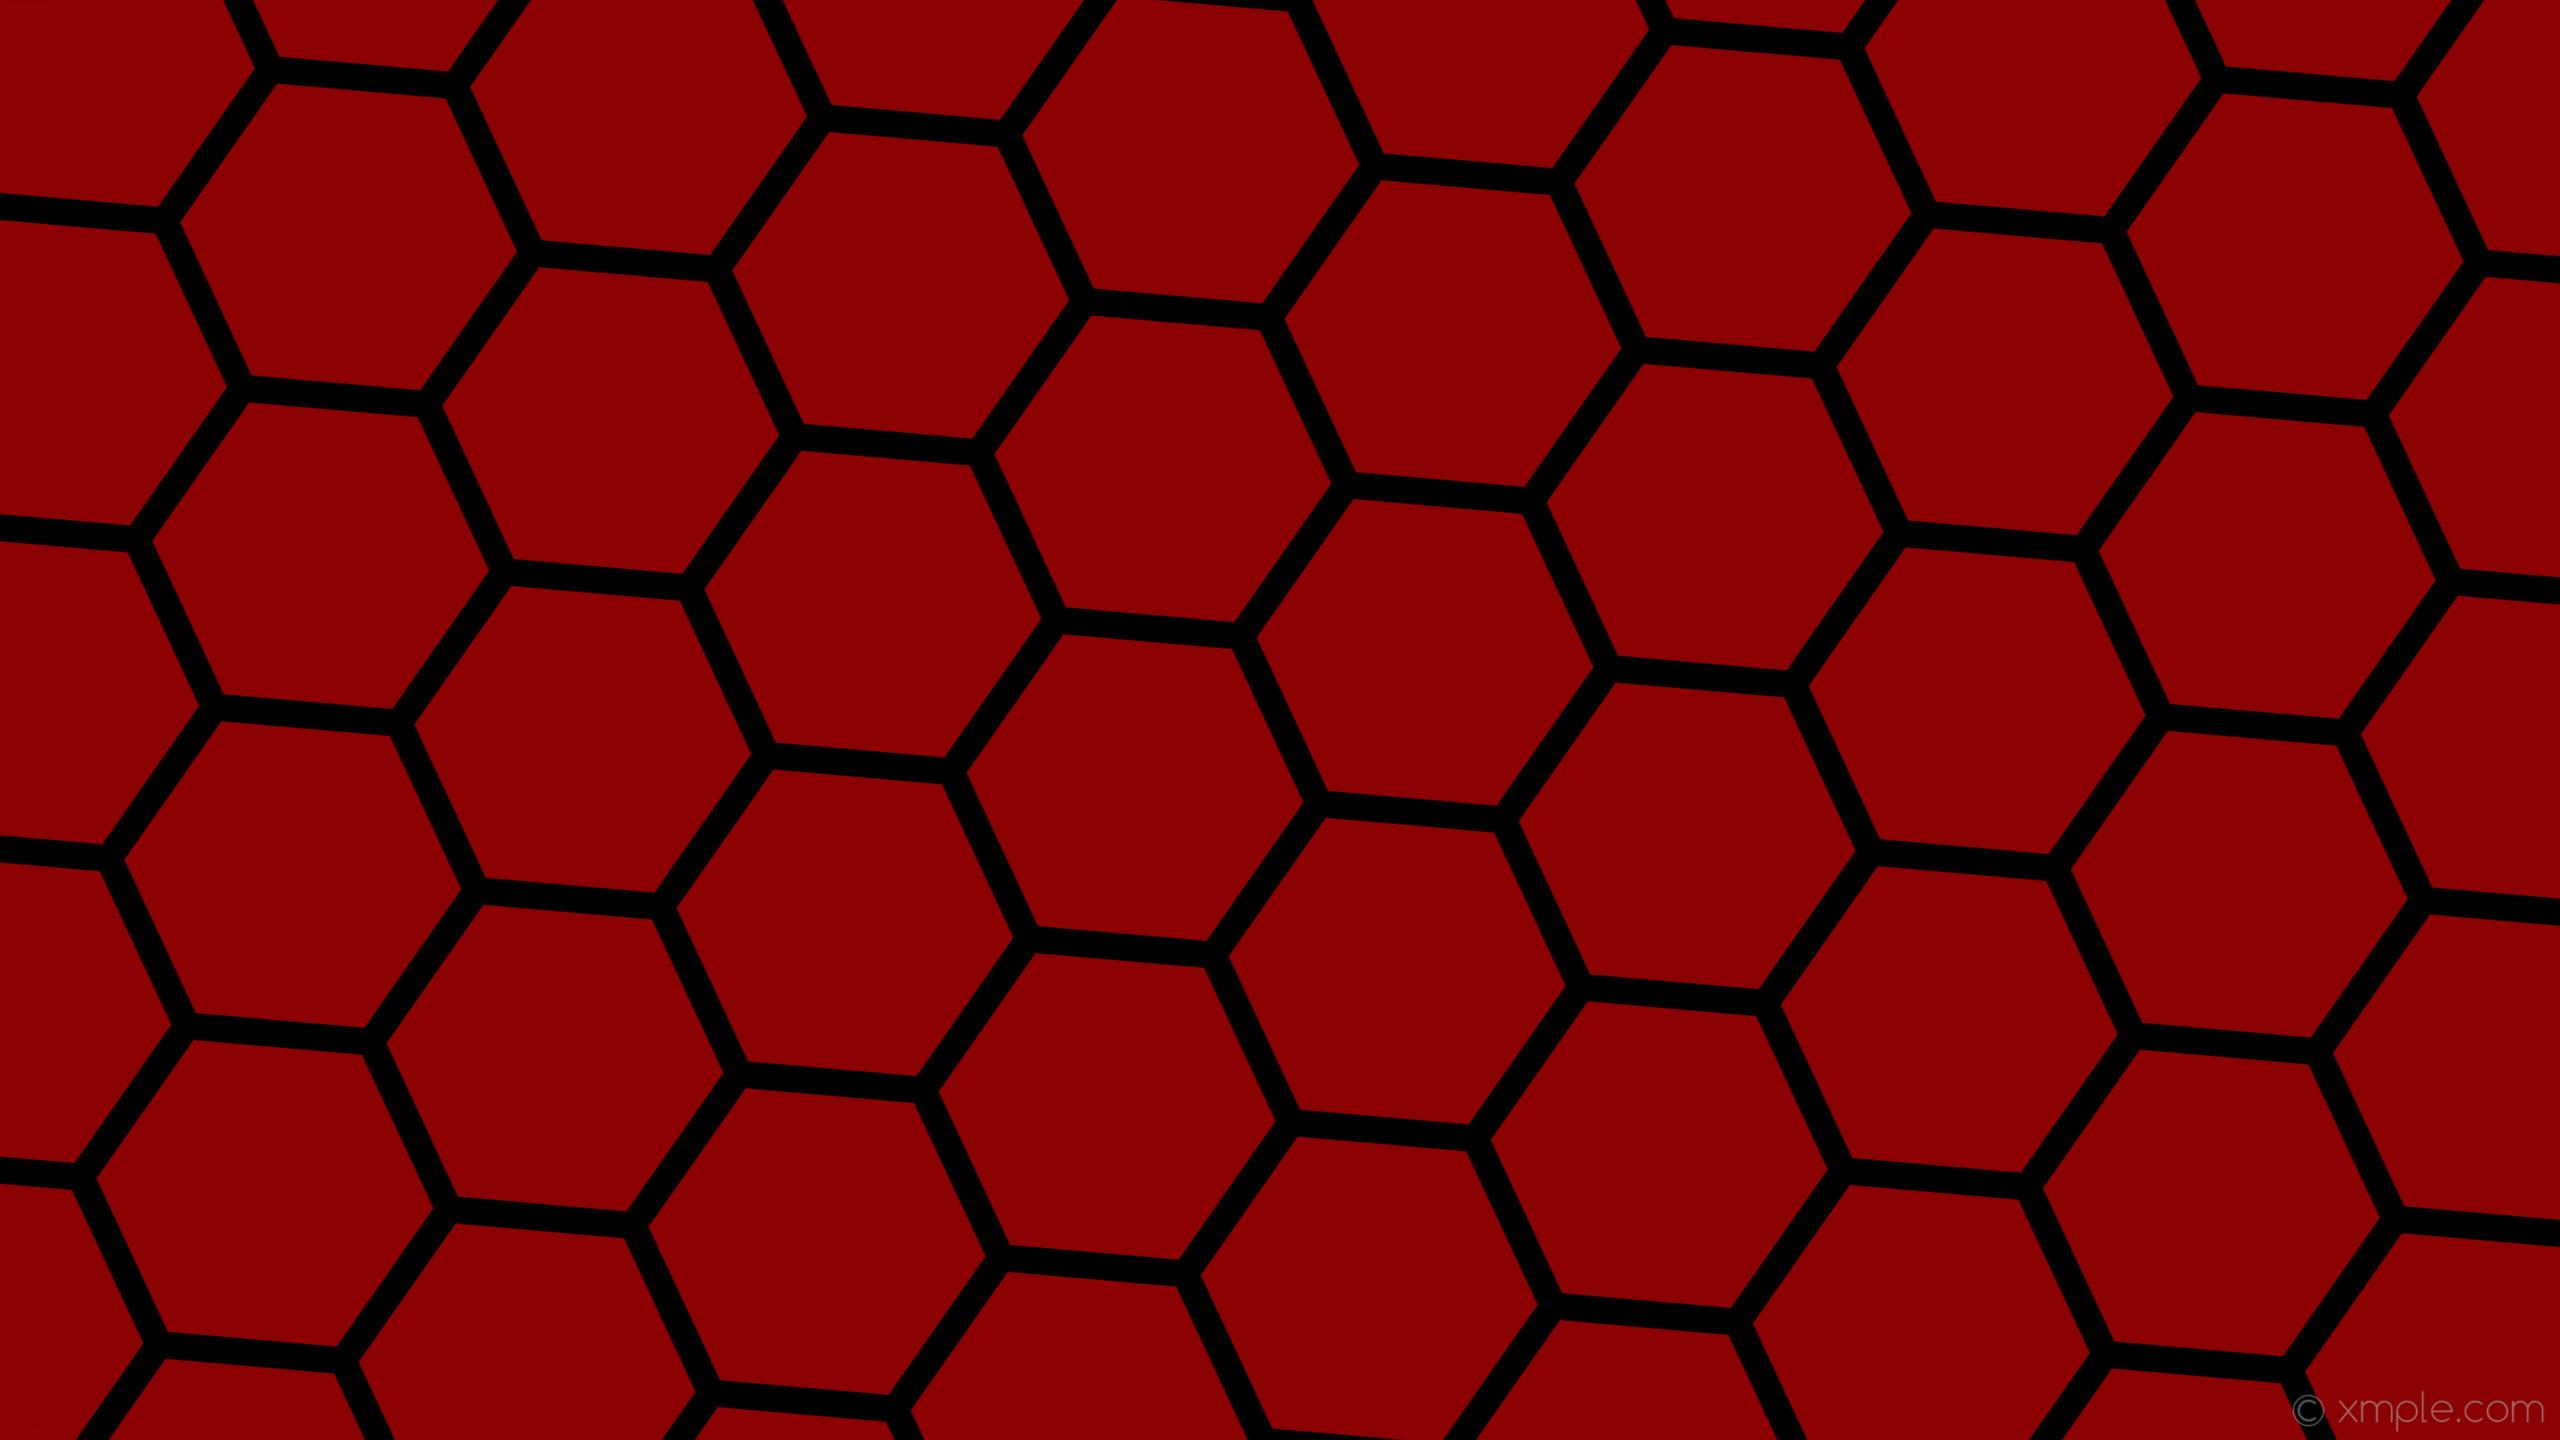 wallpaper red hexagon black honeycomb beehive dark red #8b0000 #000000  diagonal 25° 27px